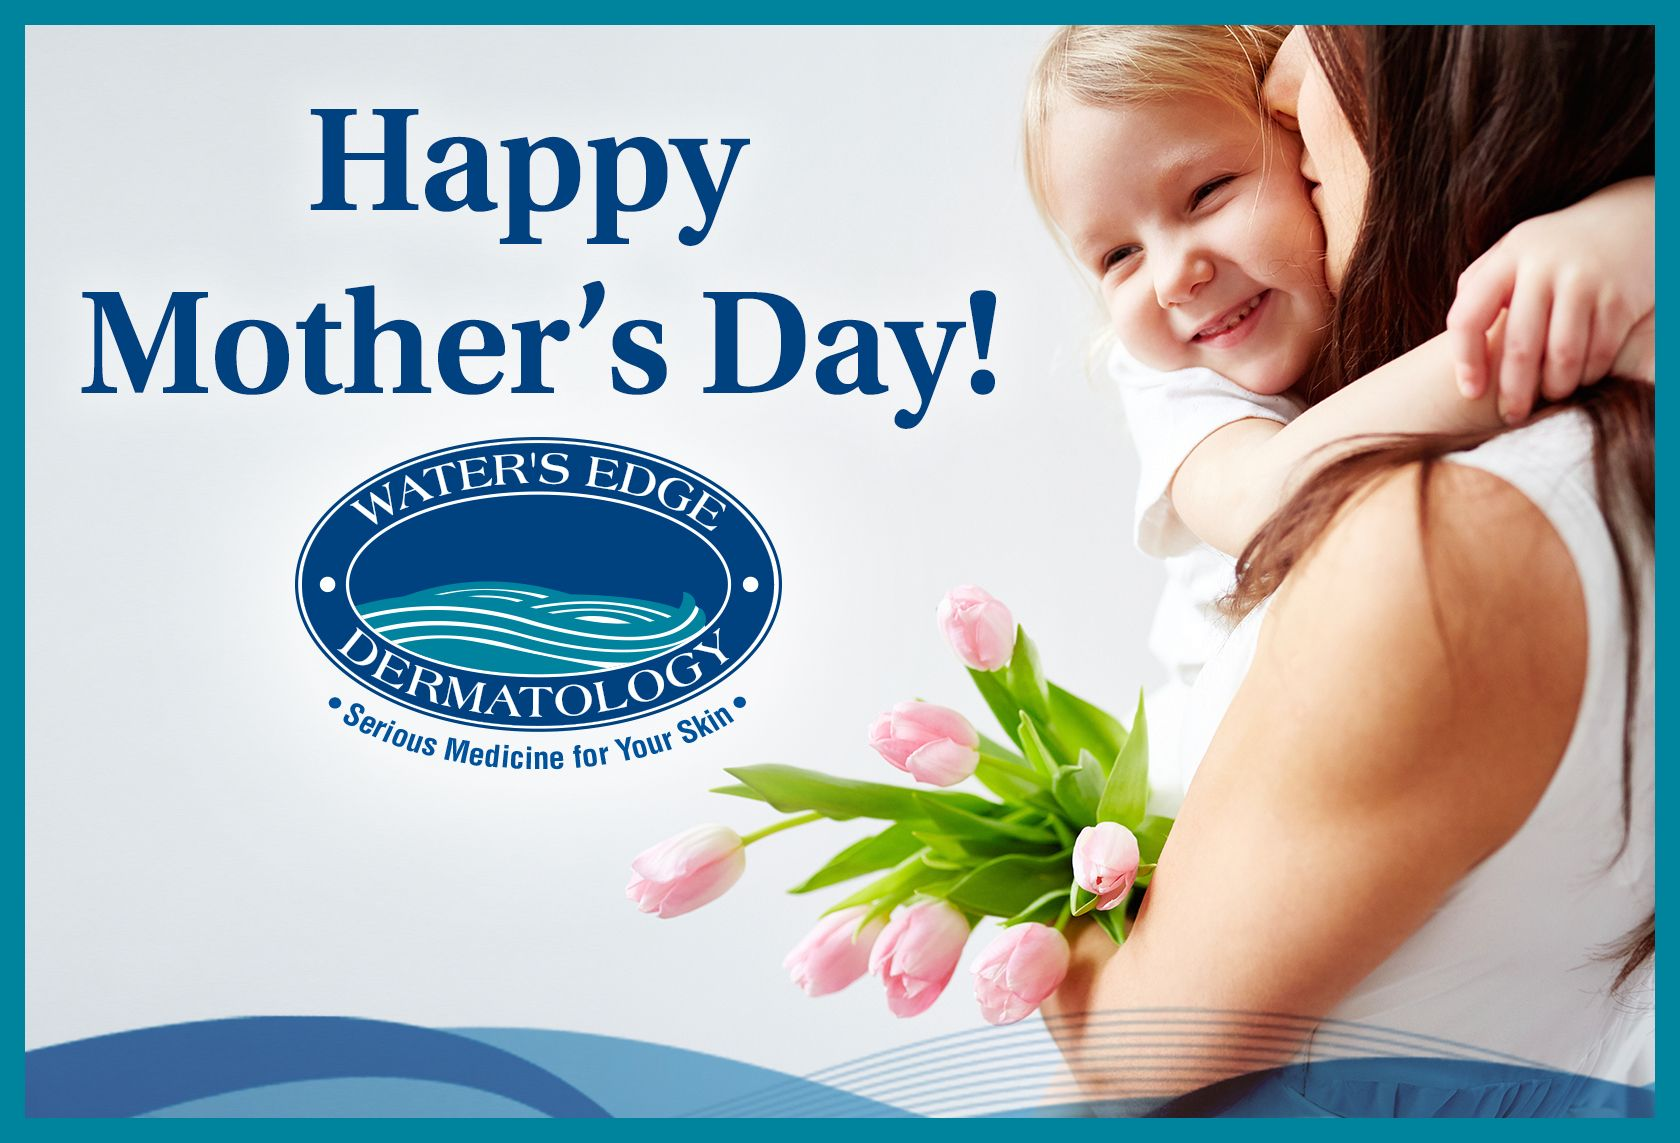 Happy MothersDay Dermatologist skin care, Dermatology